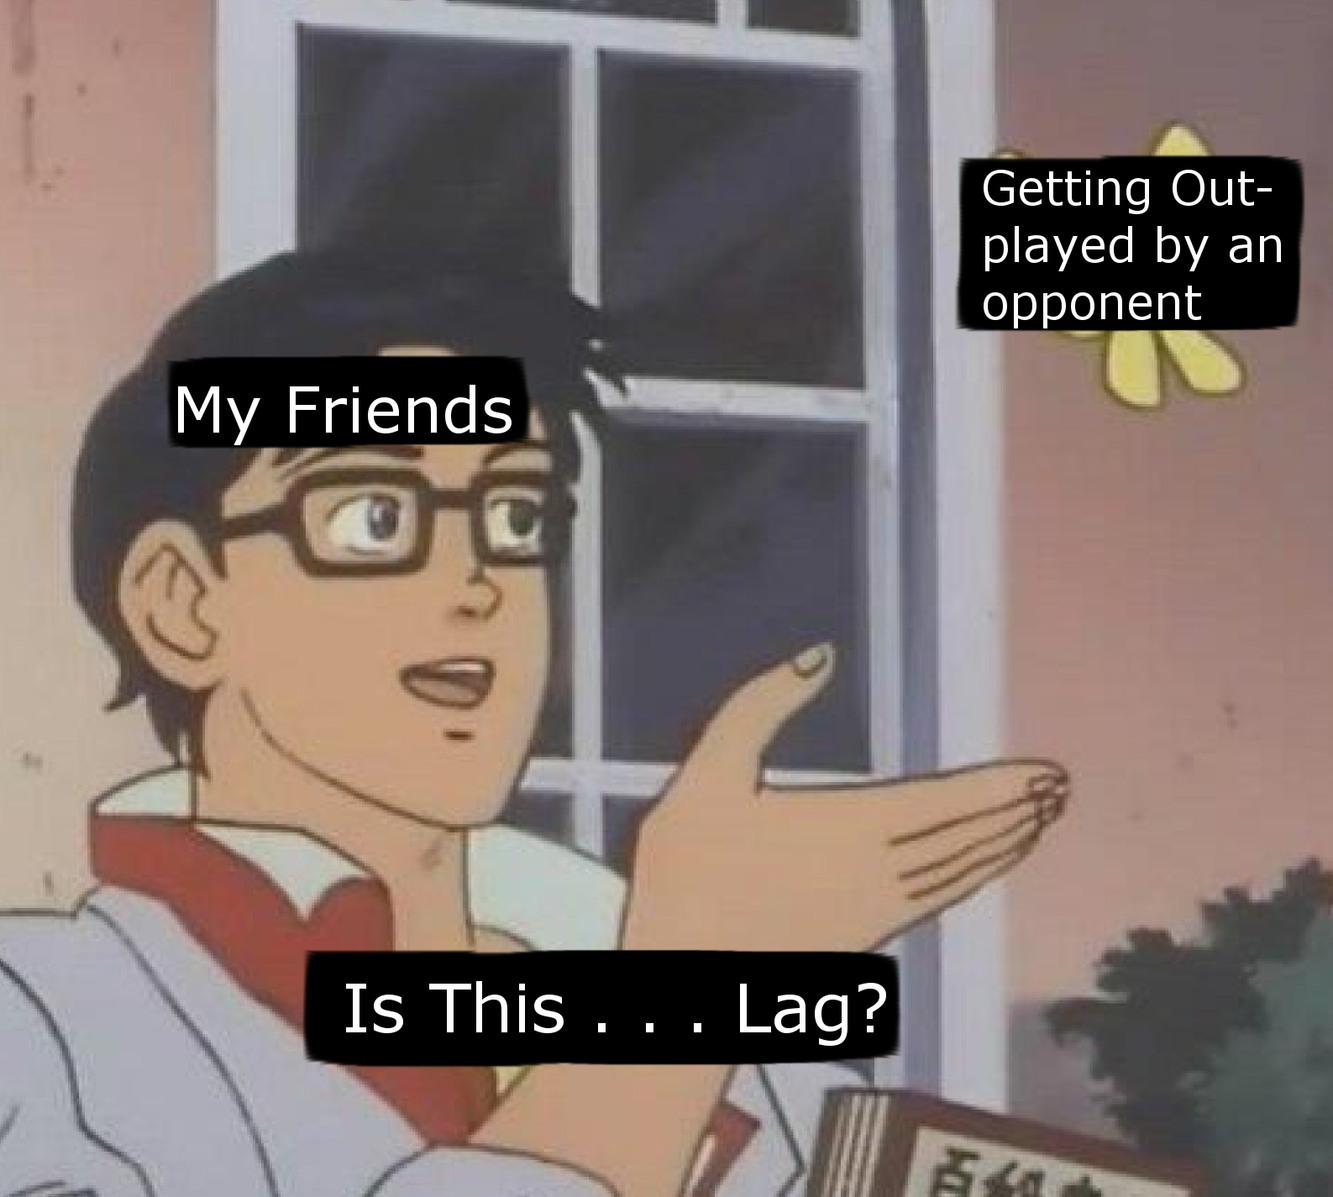 My friend be like - meme